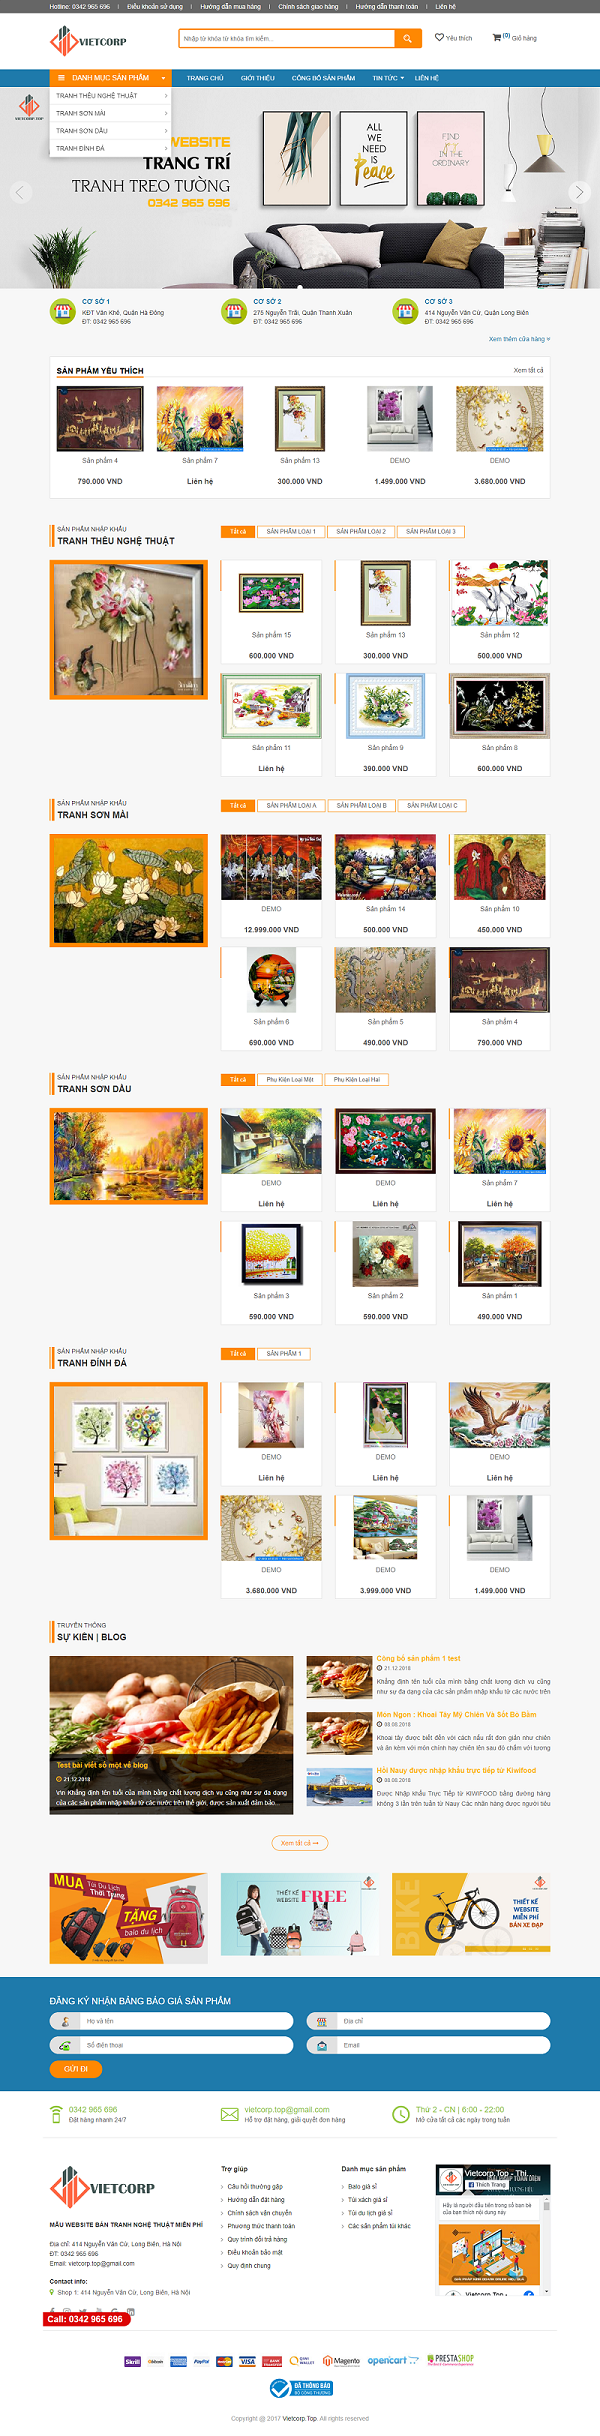 Mẫu Website Bán Tranh Nghệ Thuật